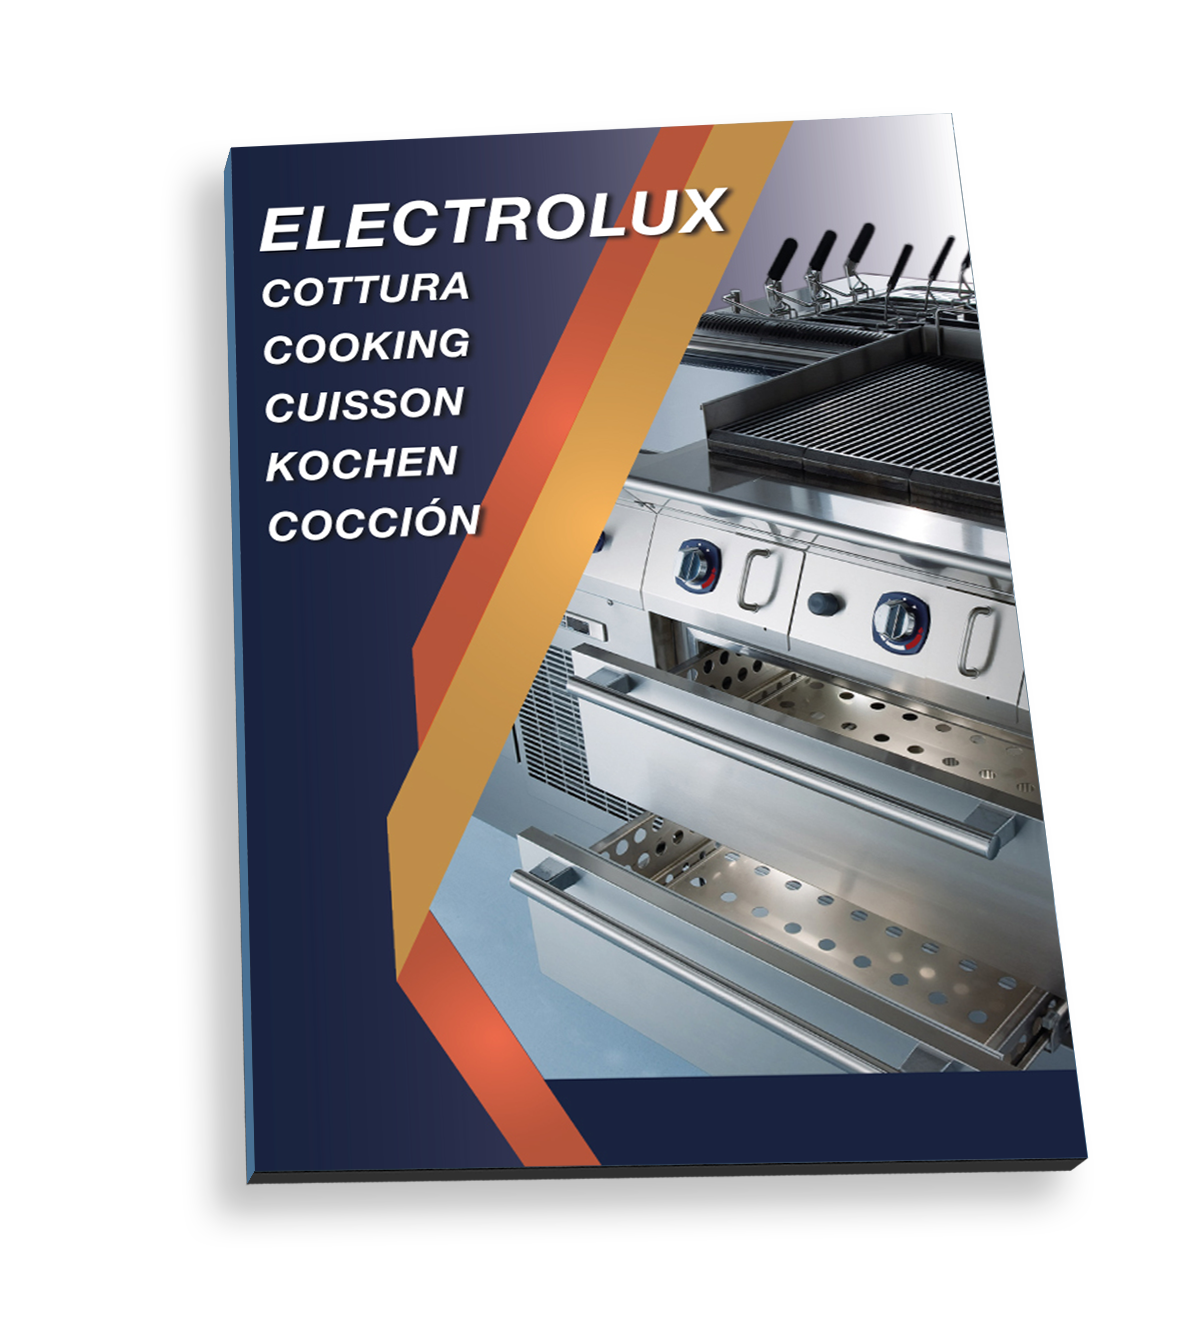 Electrolux cottura